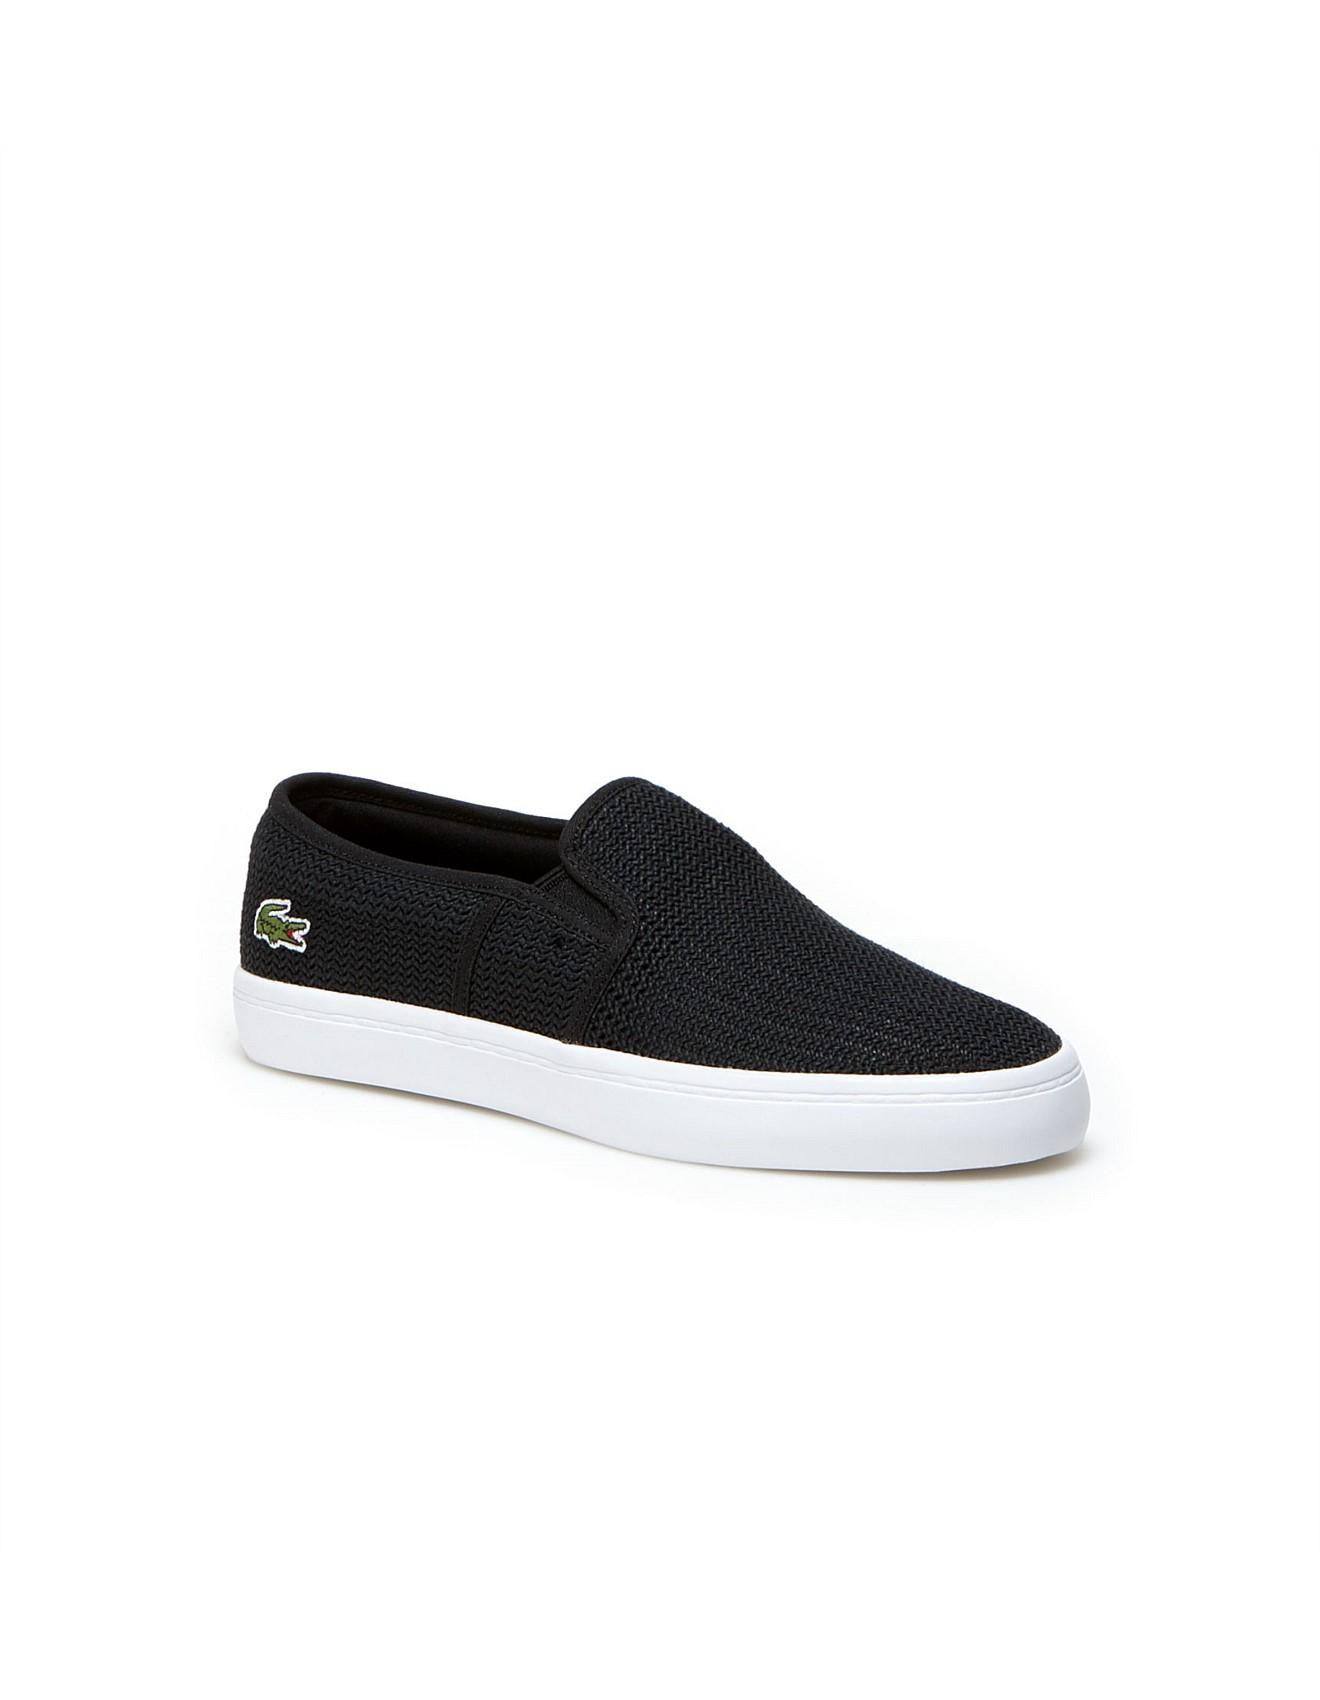 Lacoste Womens Shoes David Jones